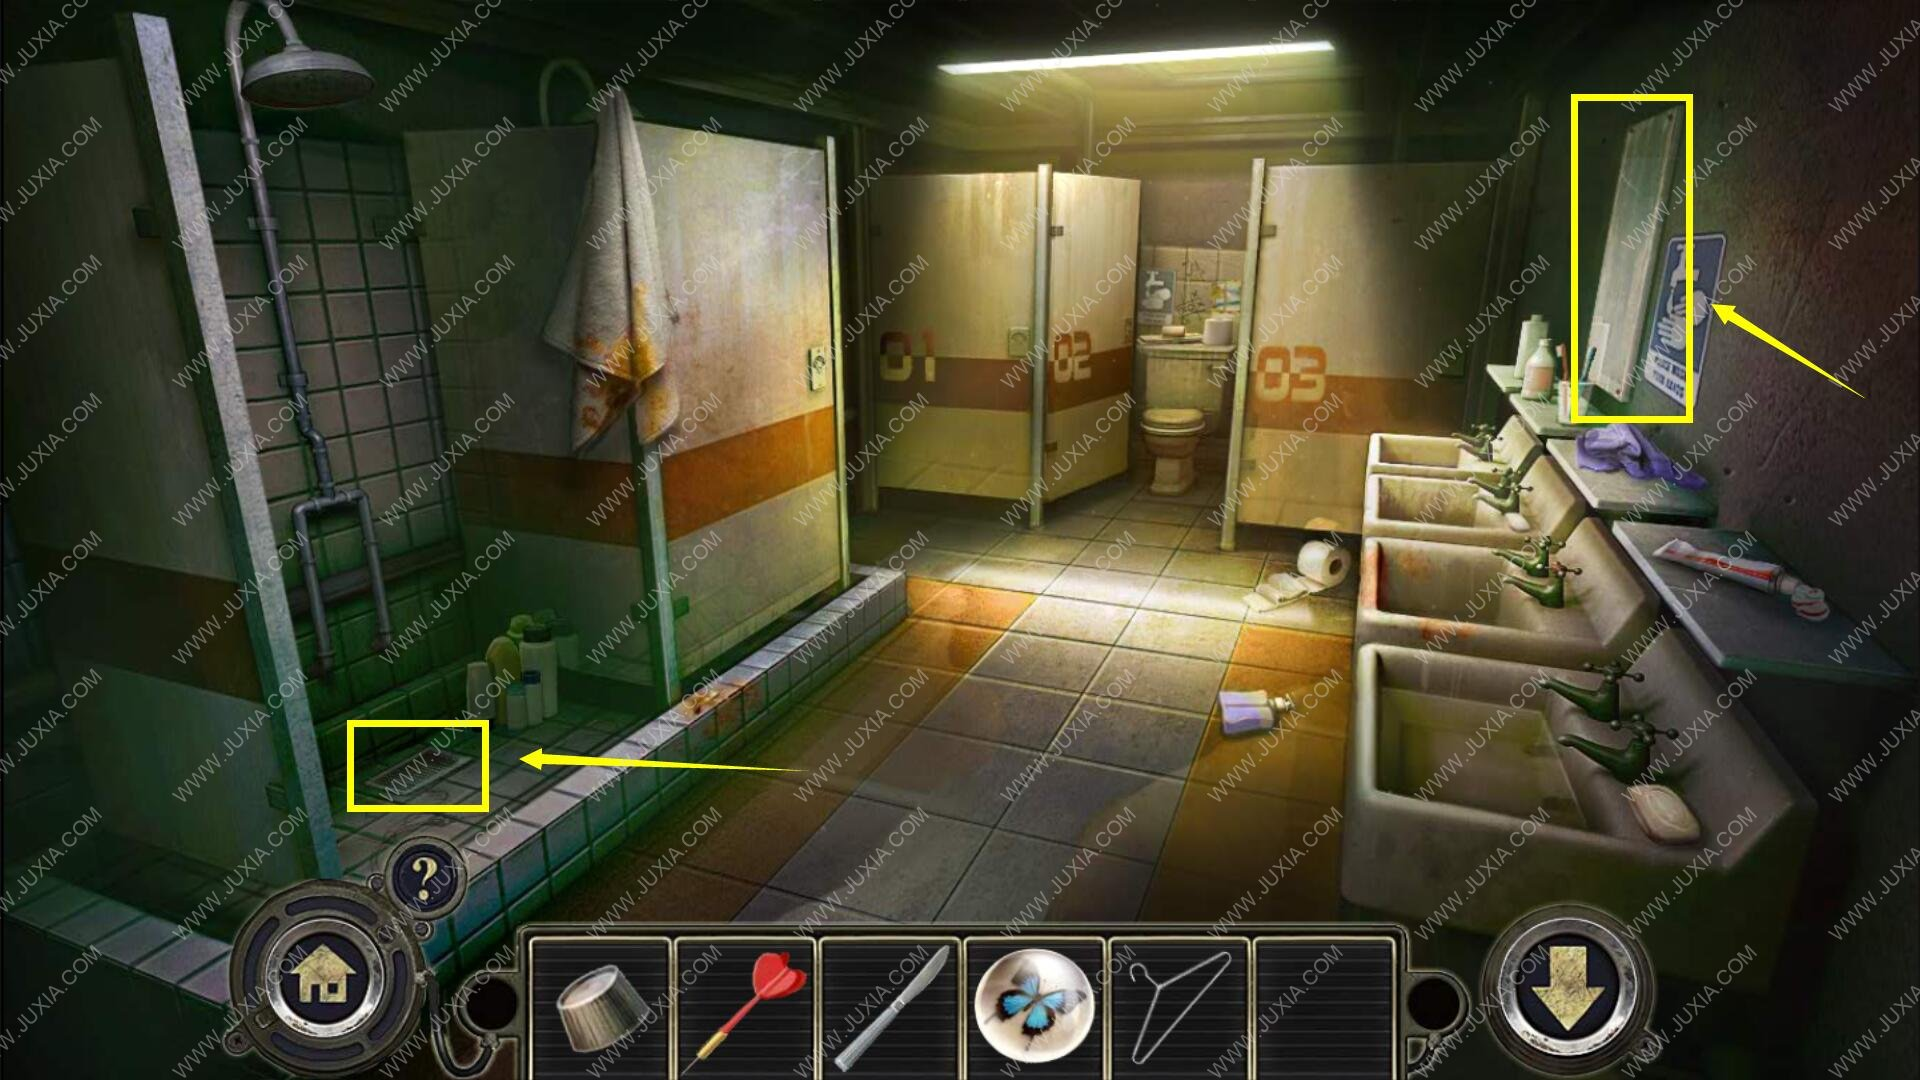 Facility47攻略第二关图文 47号房间攻略第2关电脑密码是多少